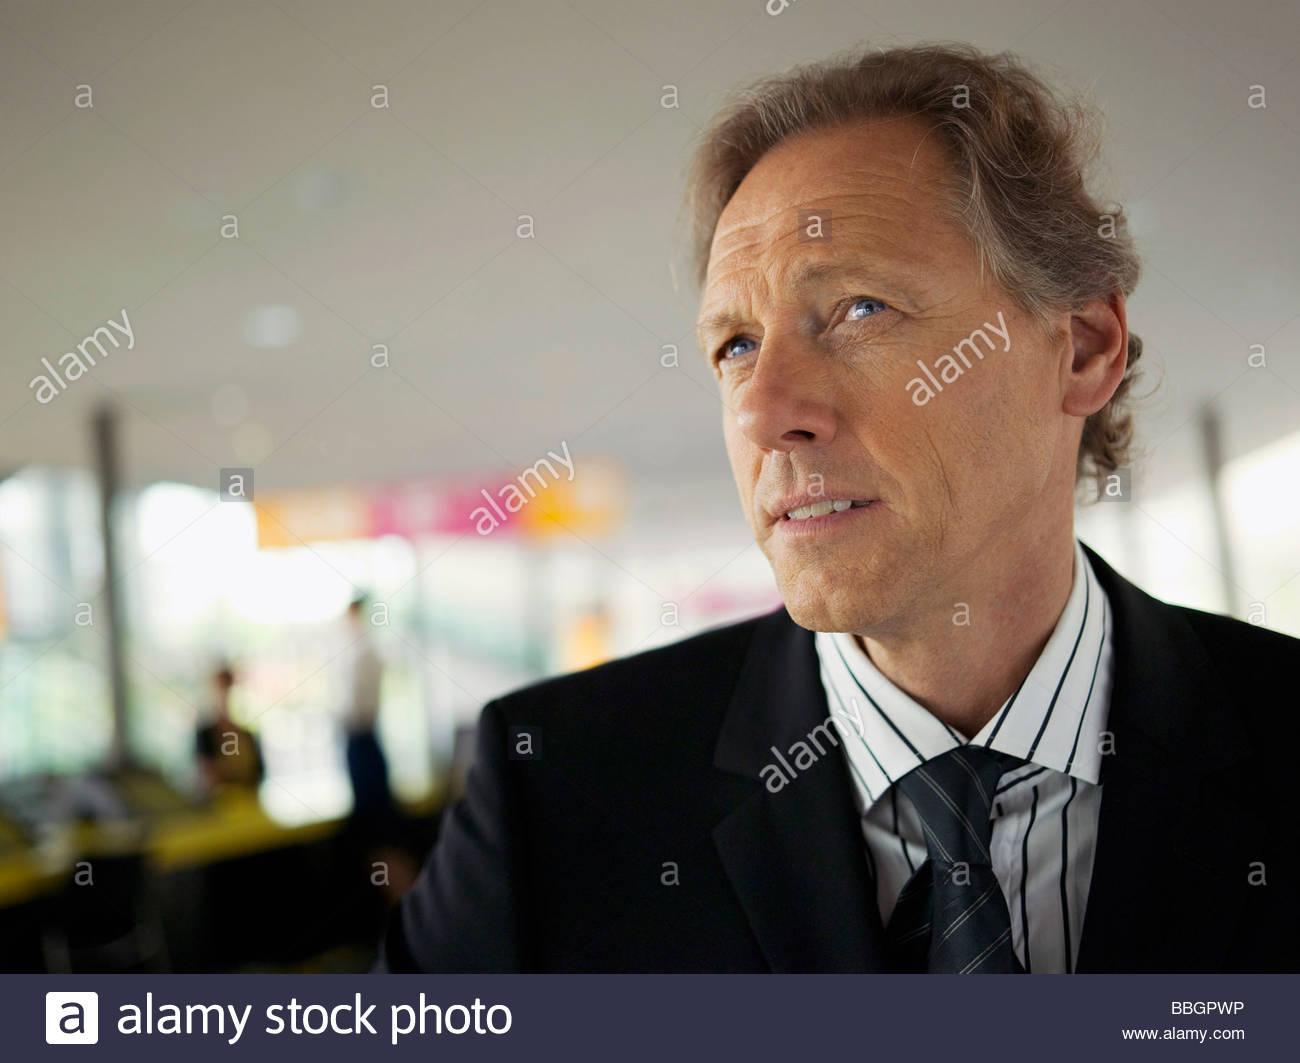 Contemplative businessman - Stock Image